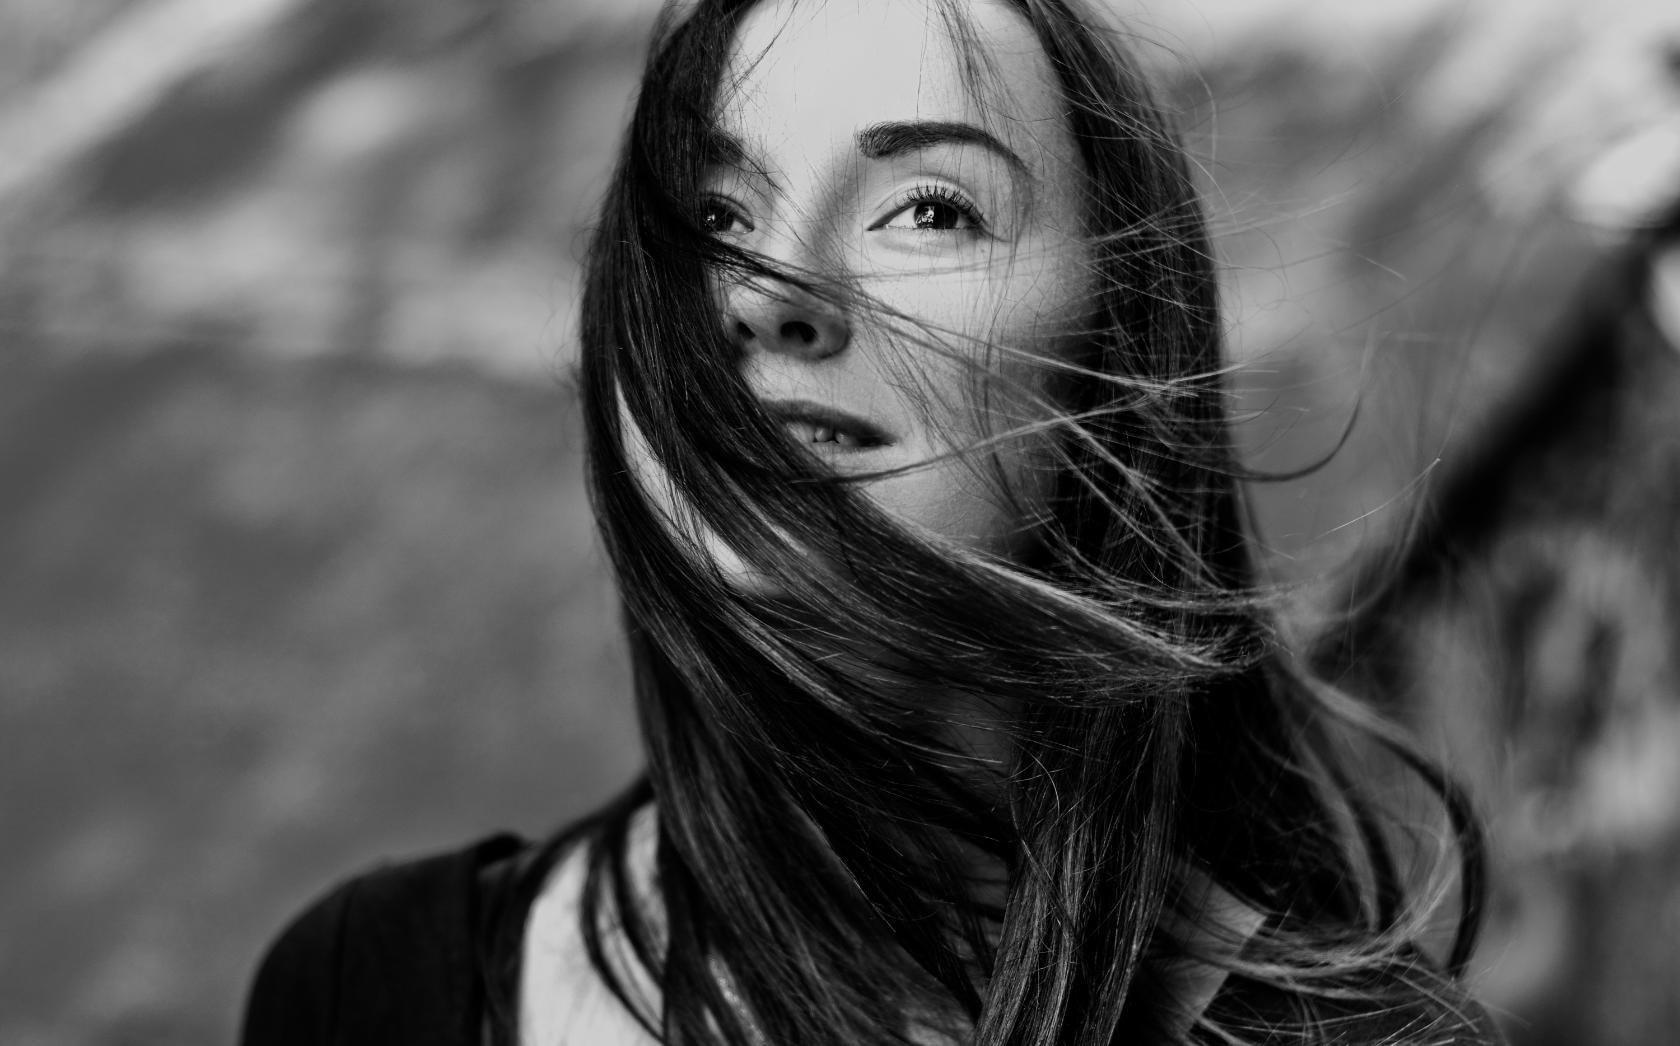 Go to Anna Utochkina's profile